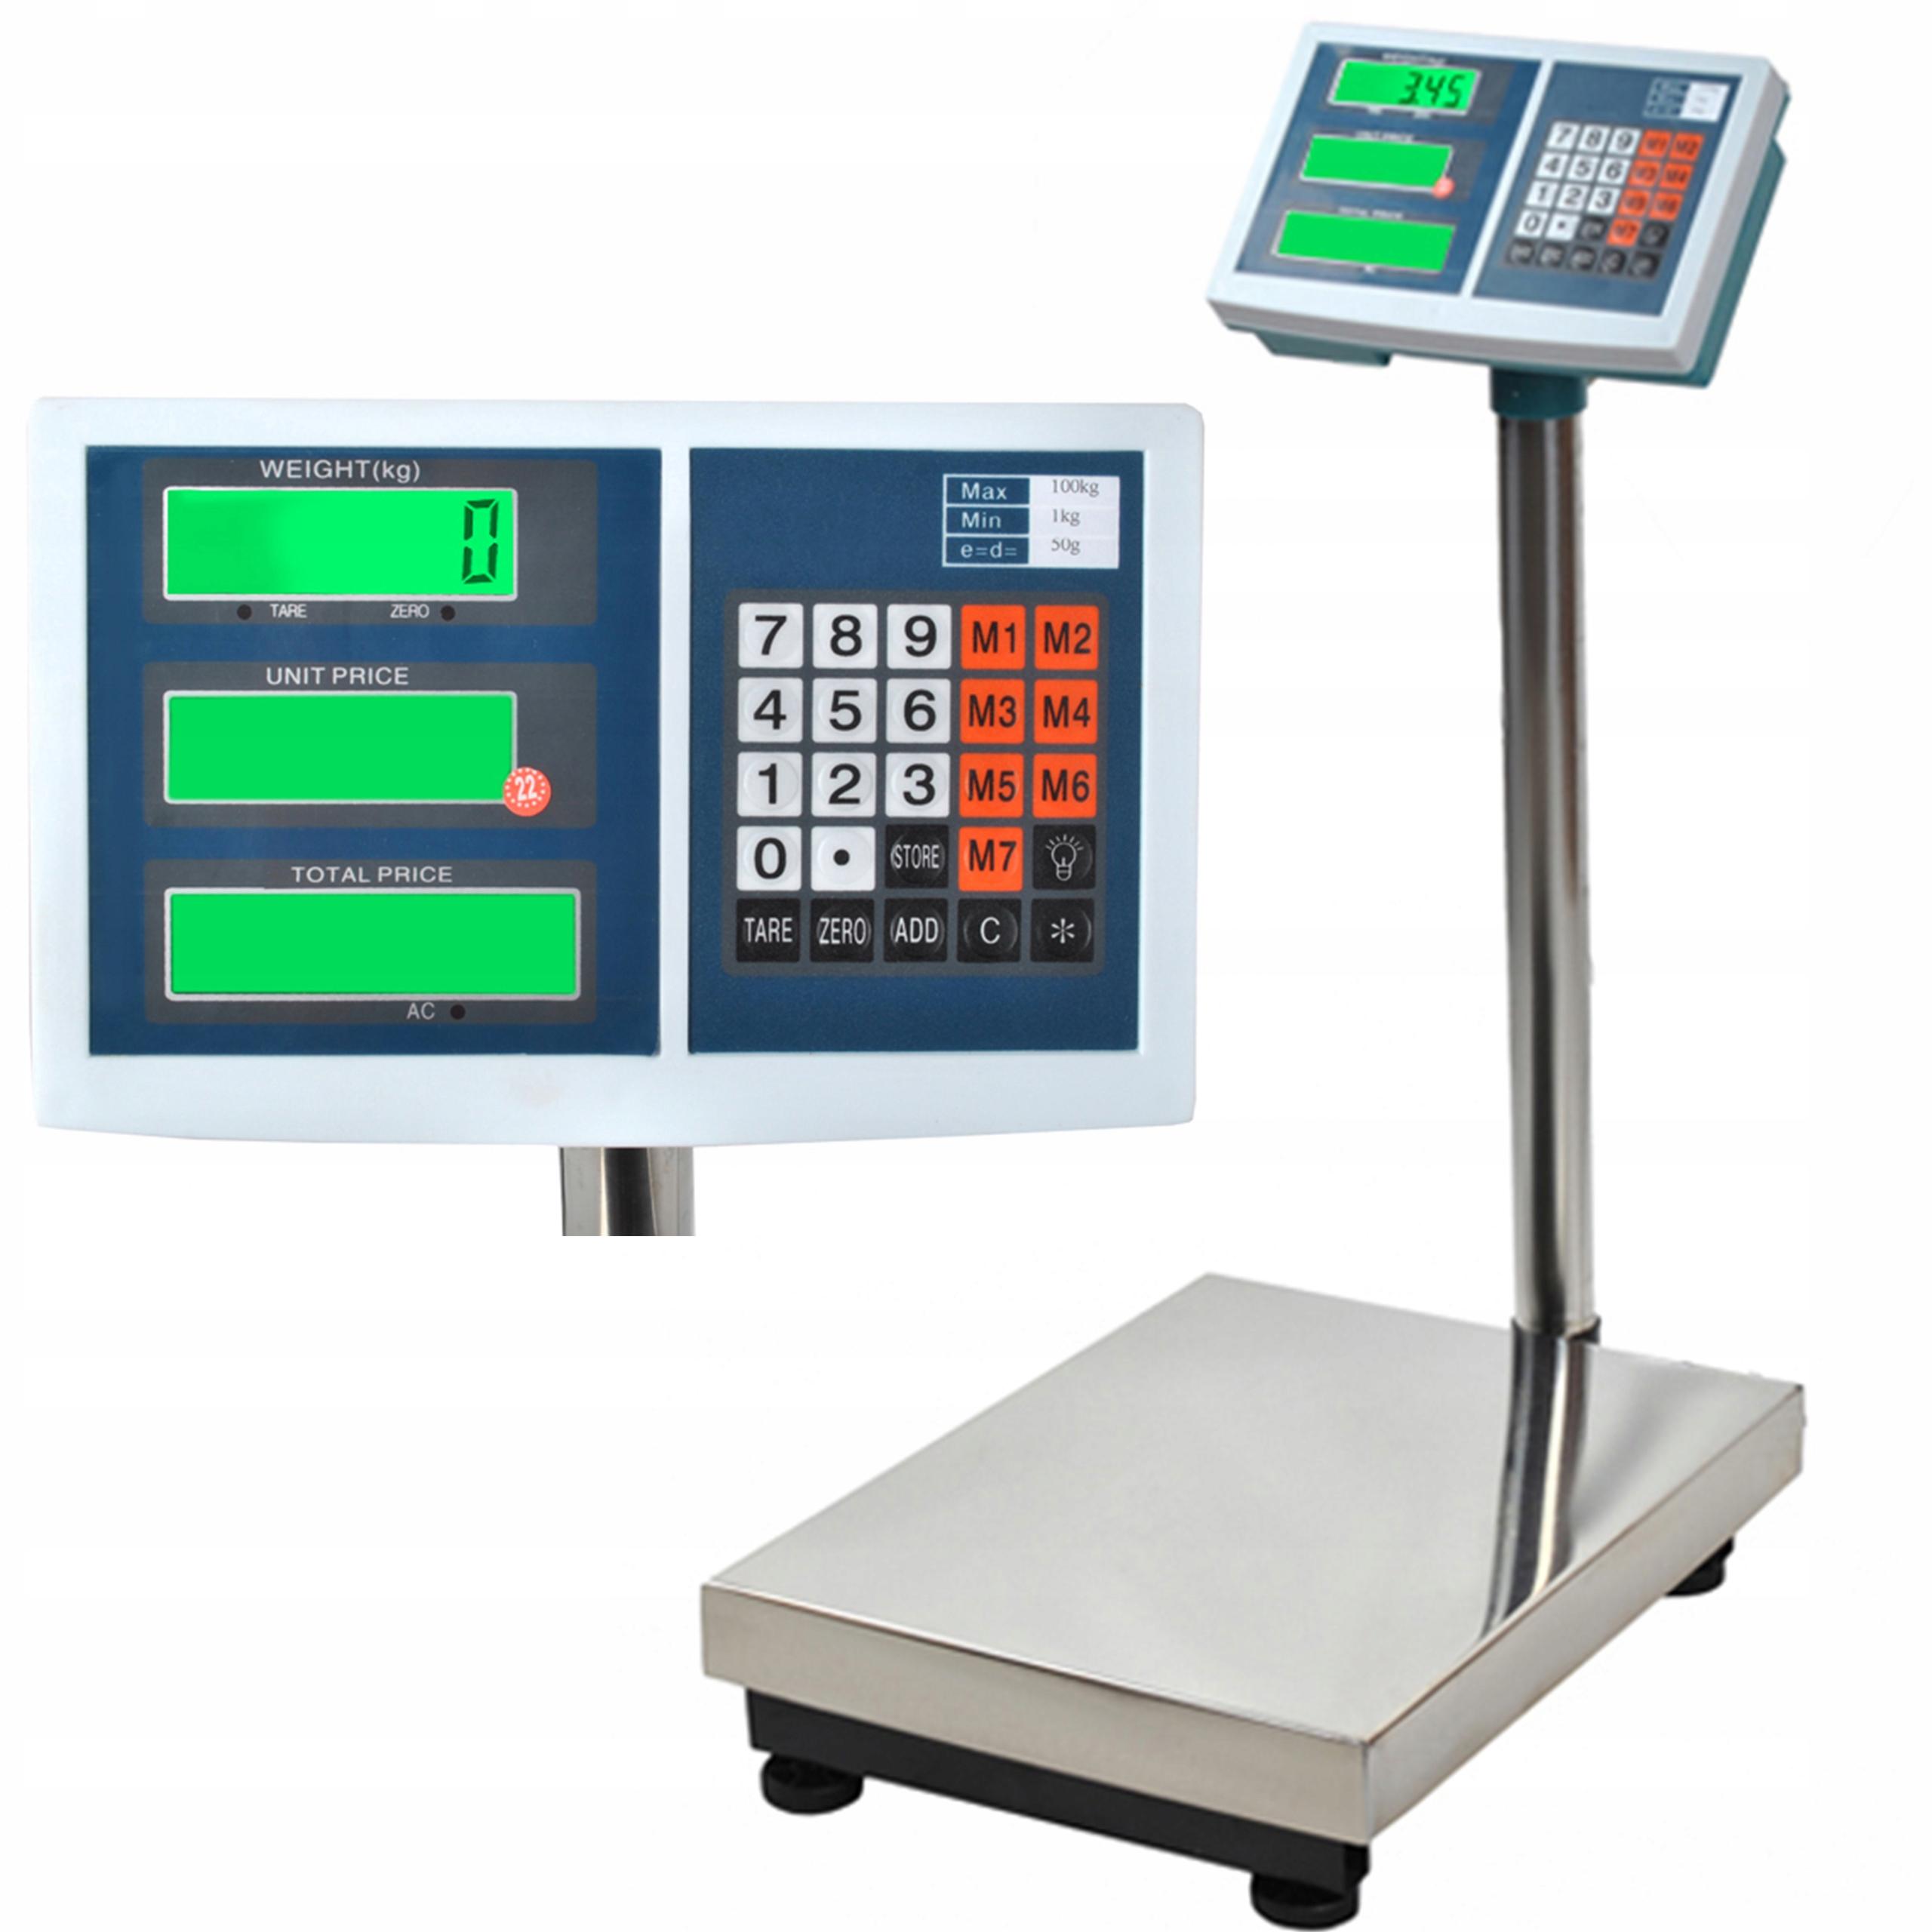 Электронный магазин весов 100кг LCD